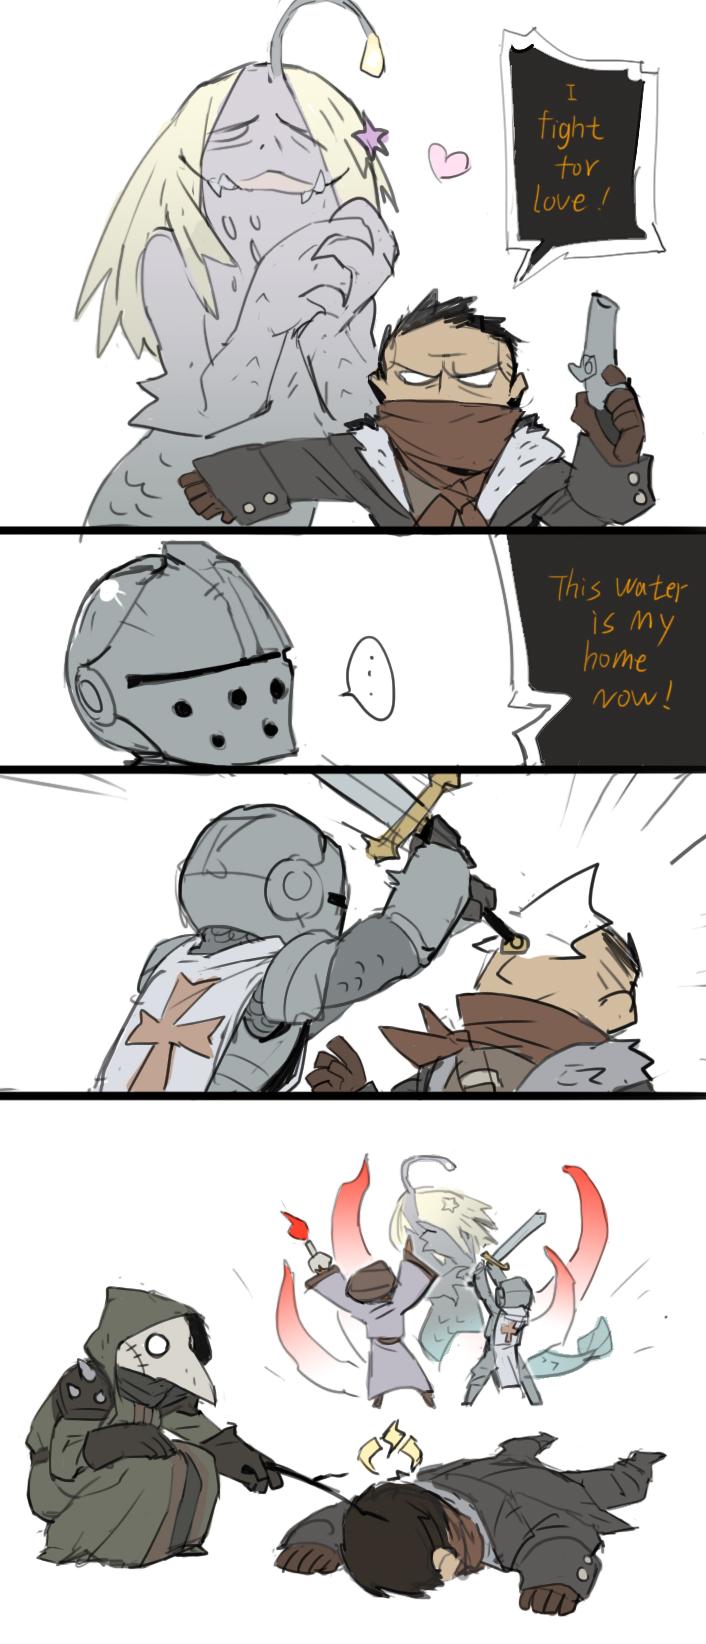 Fight for love   Darkest Dungeon   Know Your Meme